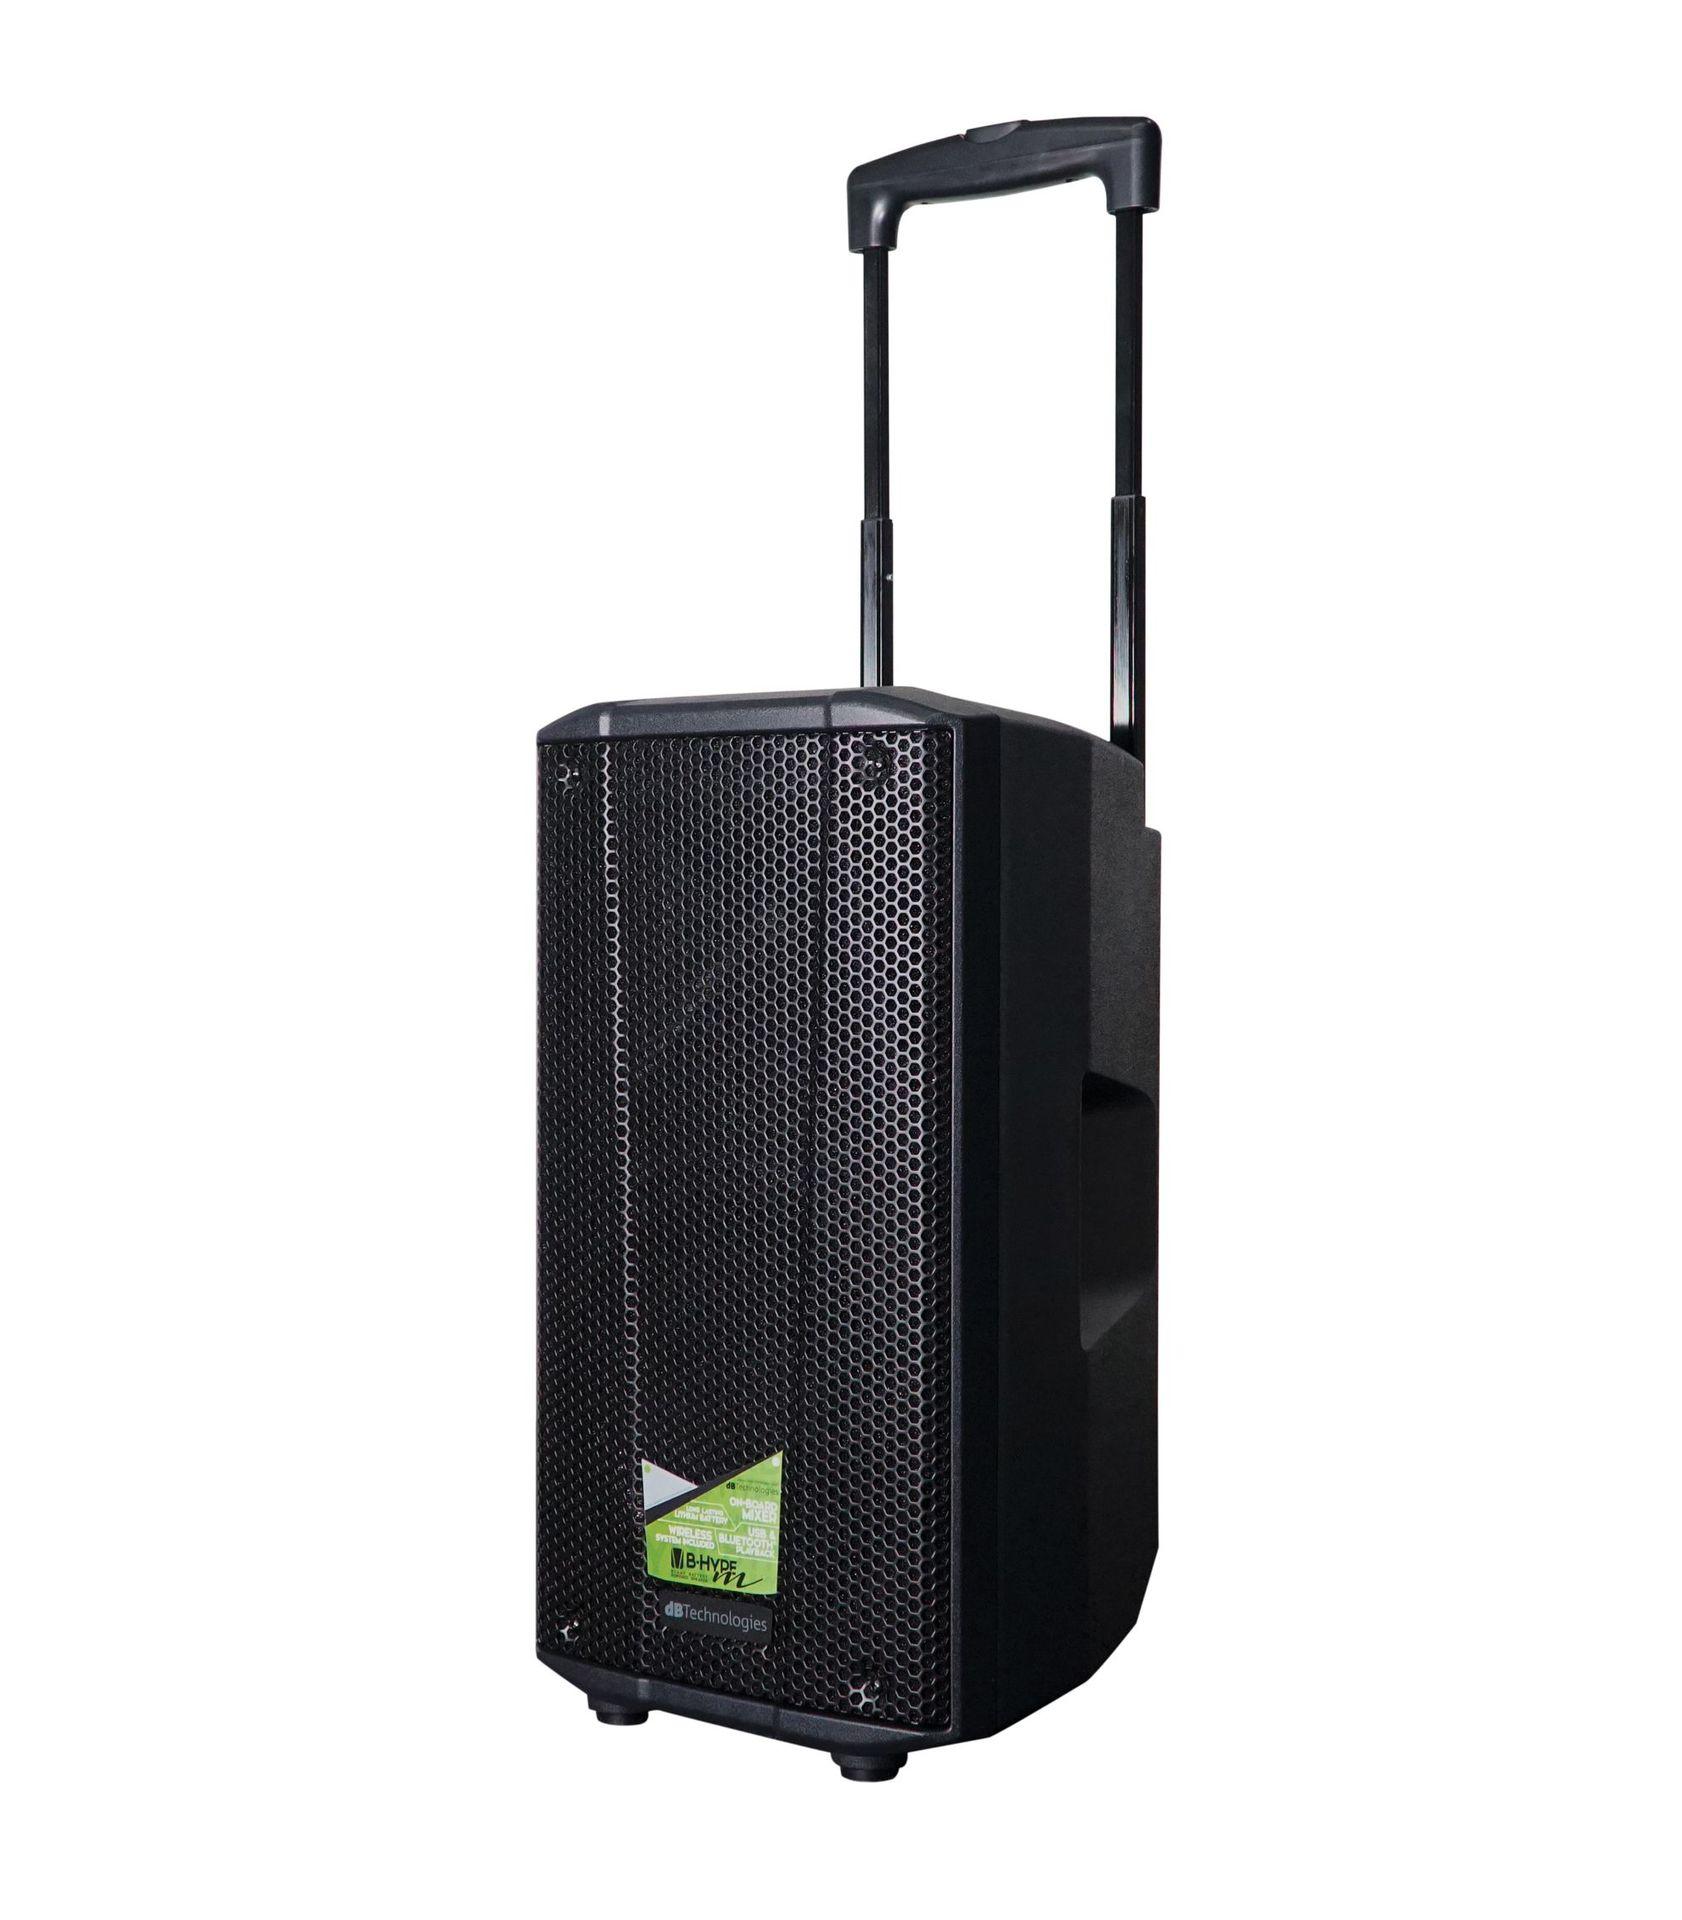 dB Technologies B-Hype Mobile HT Akkubetriebene Bluetooth-Lautsprecherbox